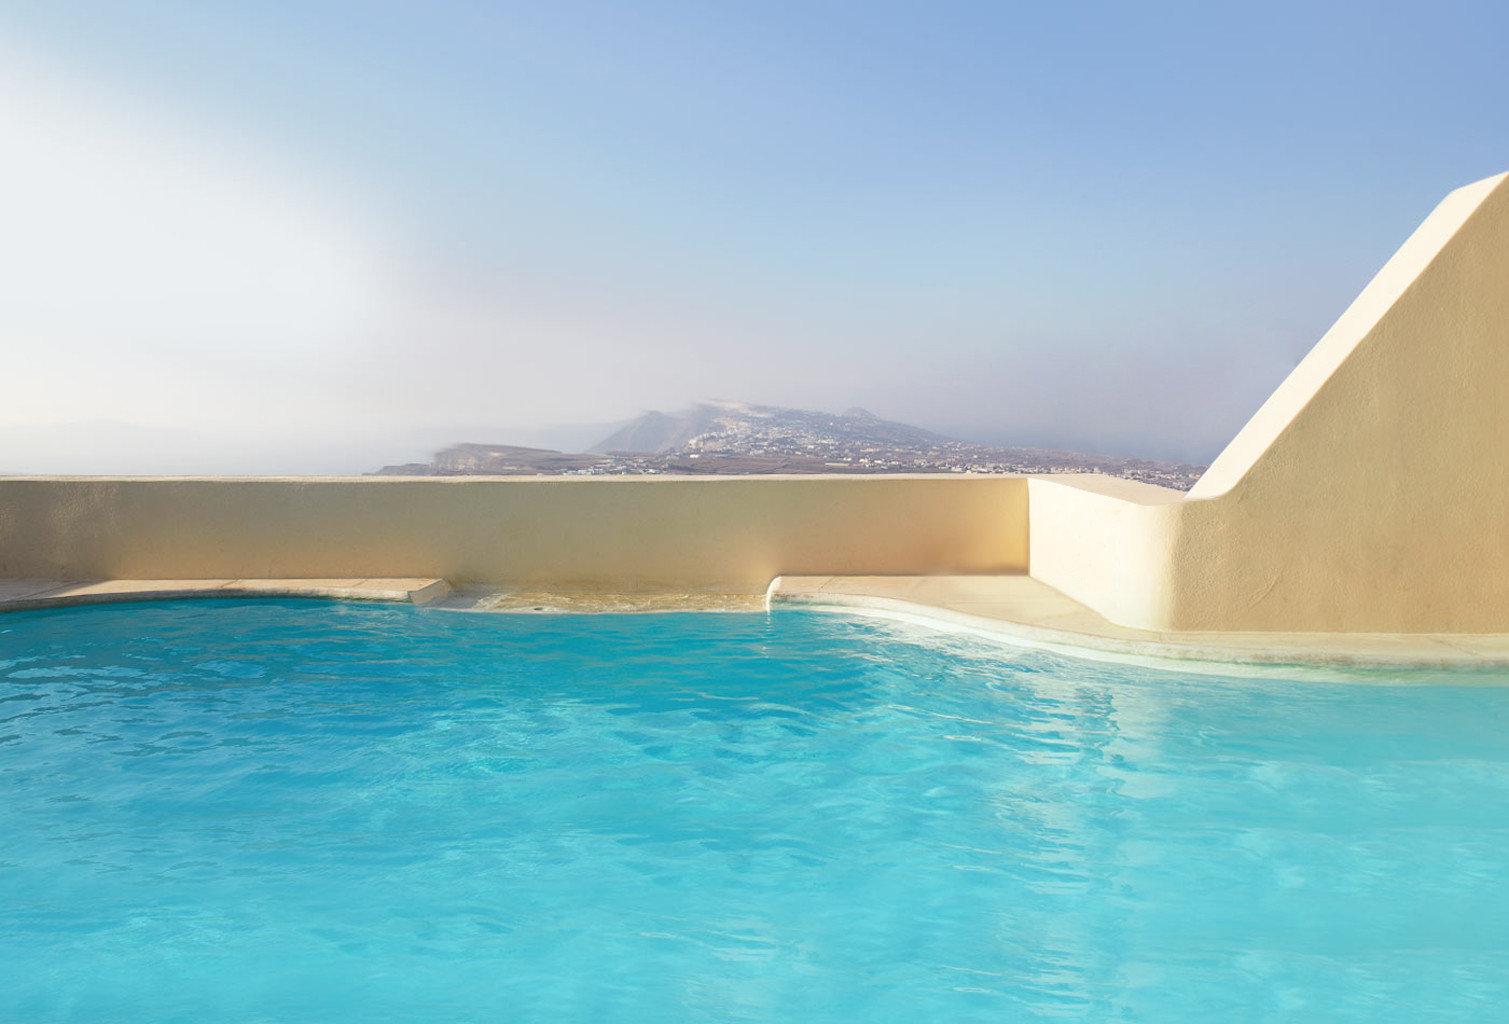 Buildings Luxury Pool Scenic views water sky swimming pool property swimming Sea Ocean Nature blue shore